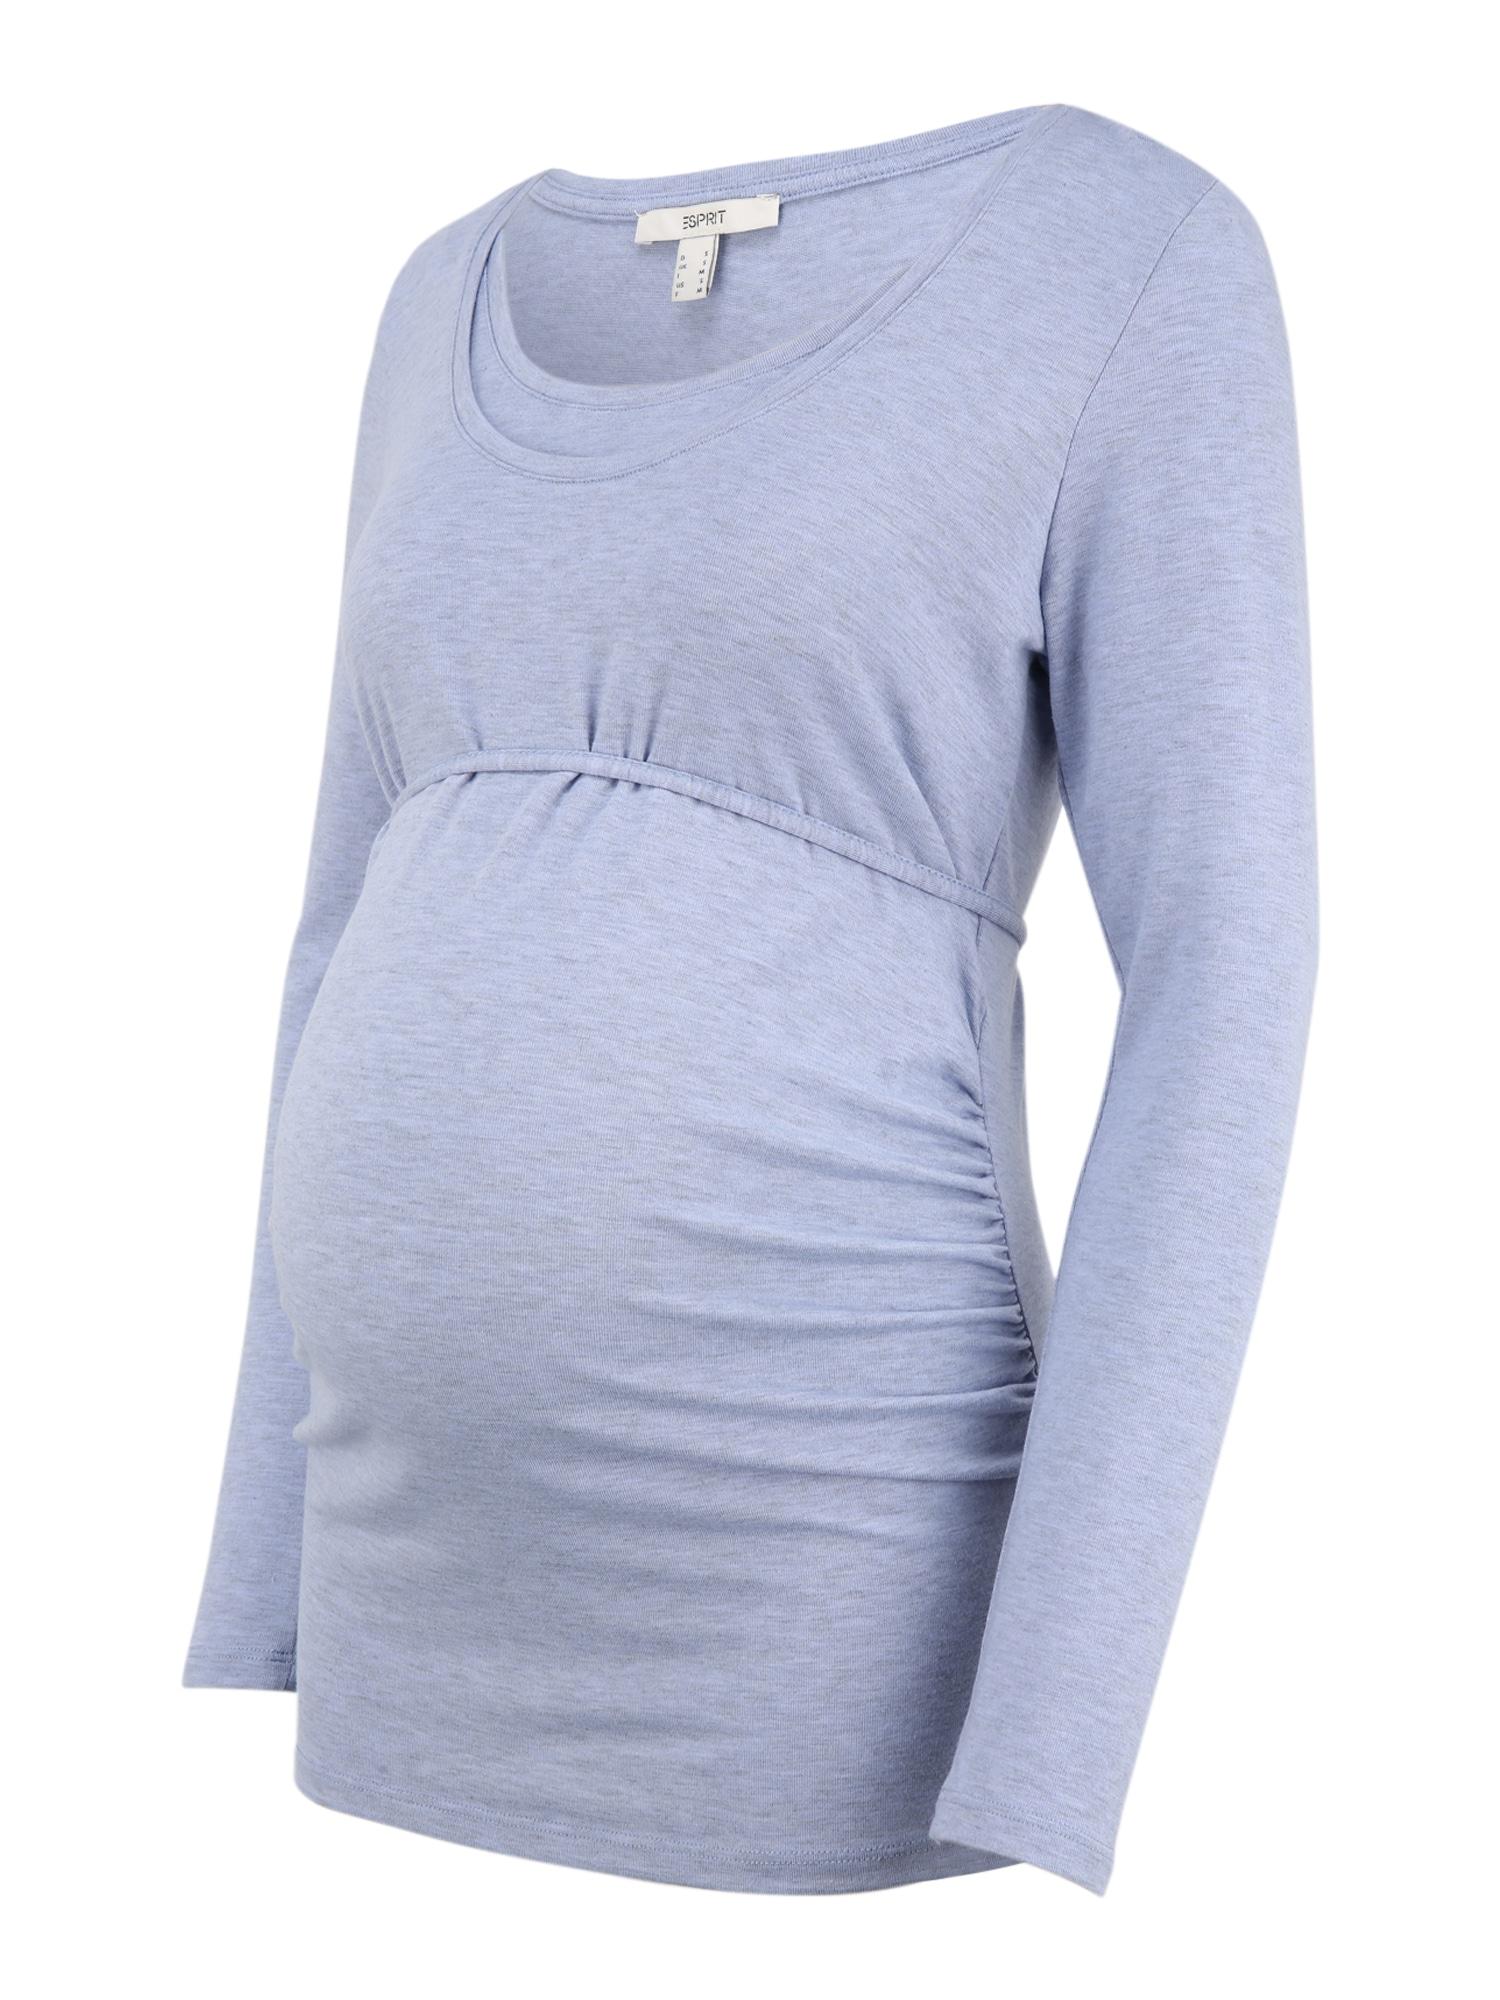 Esprit Maternity Marškinėliai mėlyna